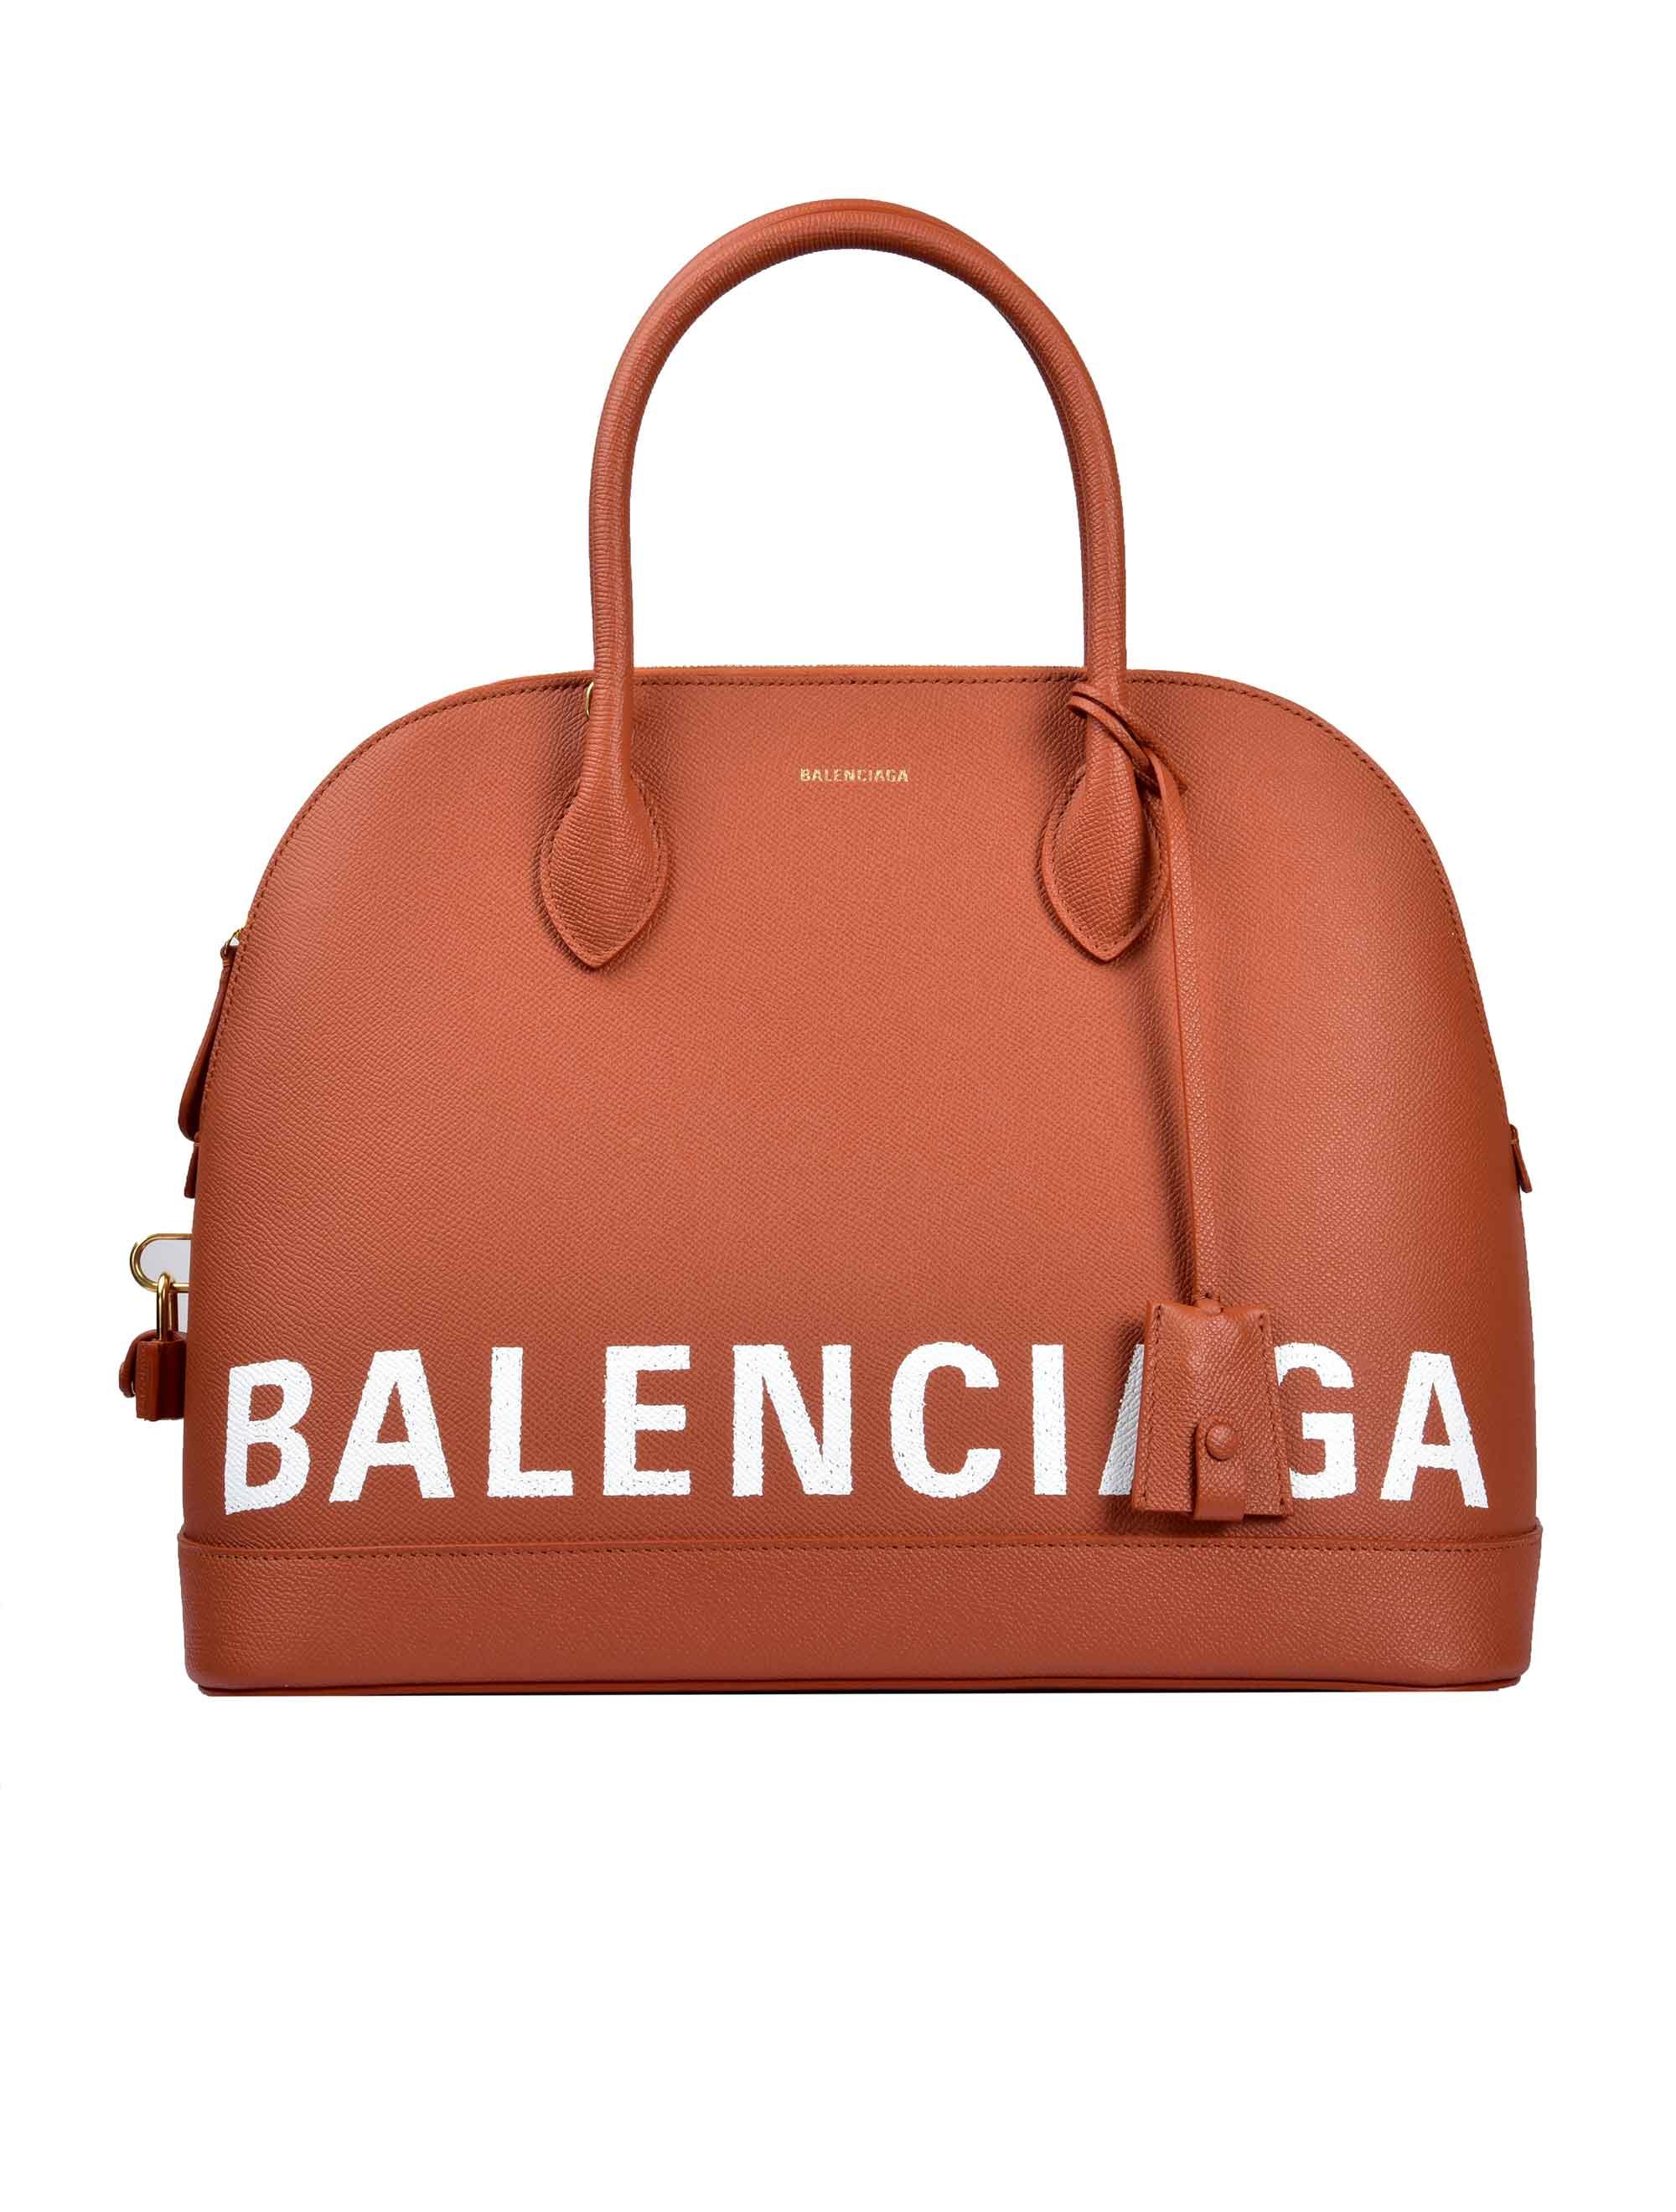 0a07bd0fec Mimma Ninni – Luxury and Fashion Shopping. Balenciaga Ville Top ...